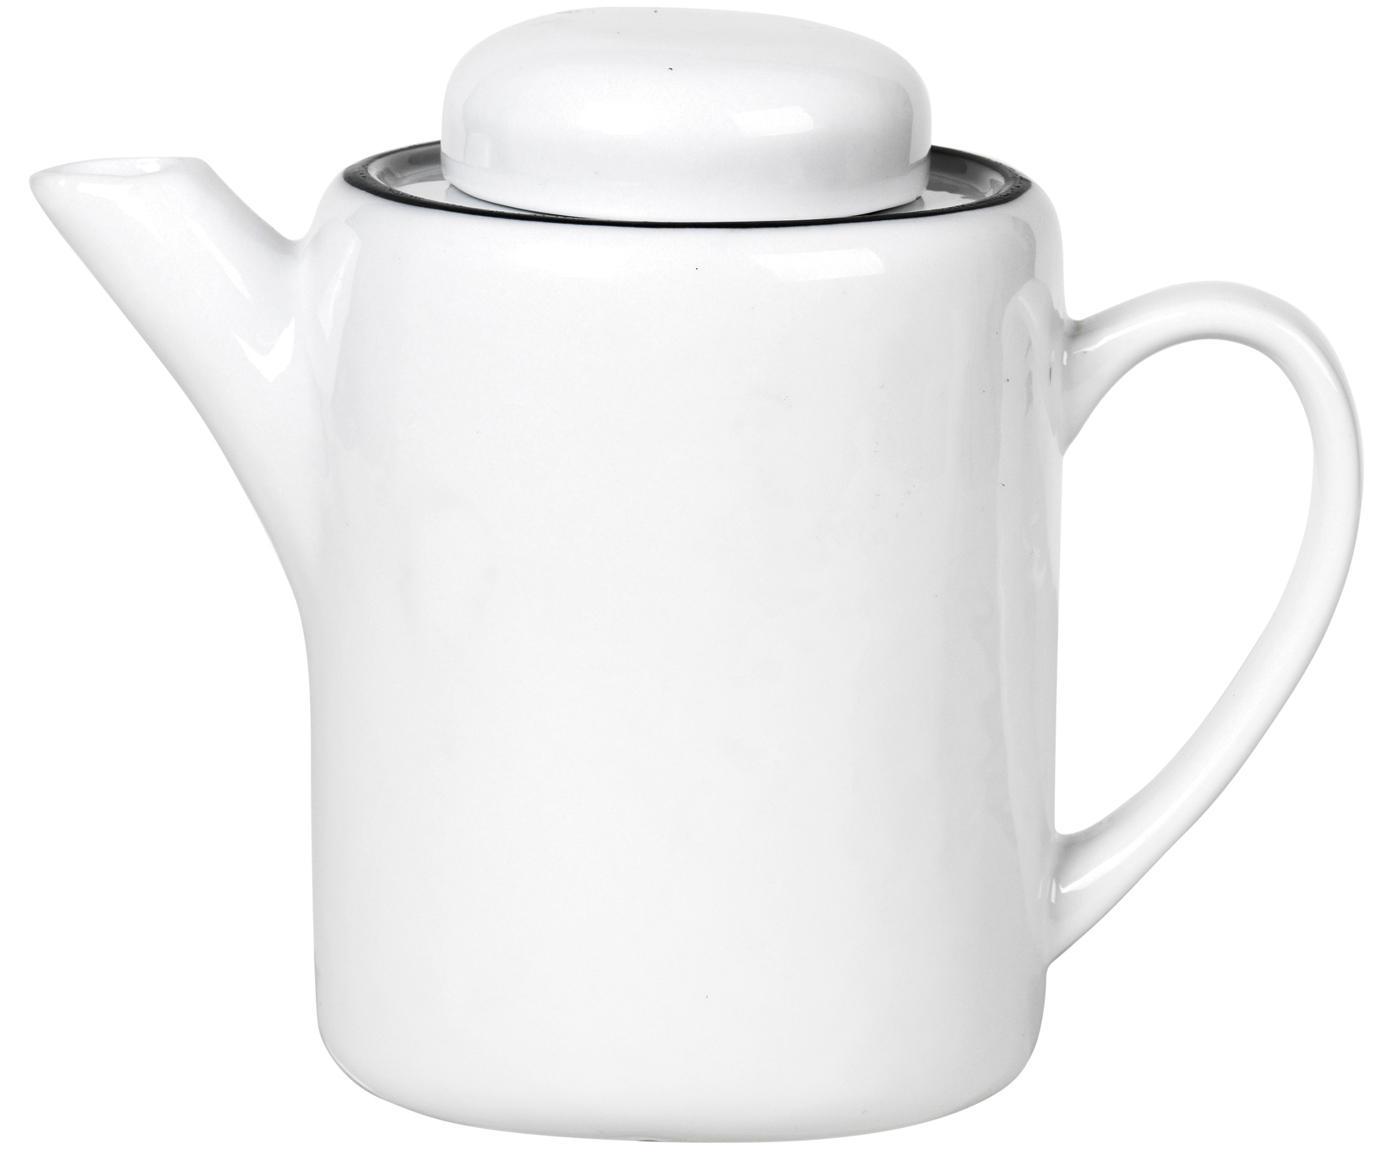 Handgemaakte theepot Salt, Porselein, Gebroken wit, zwart, 1.3 L